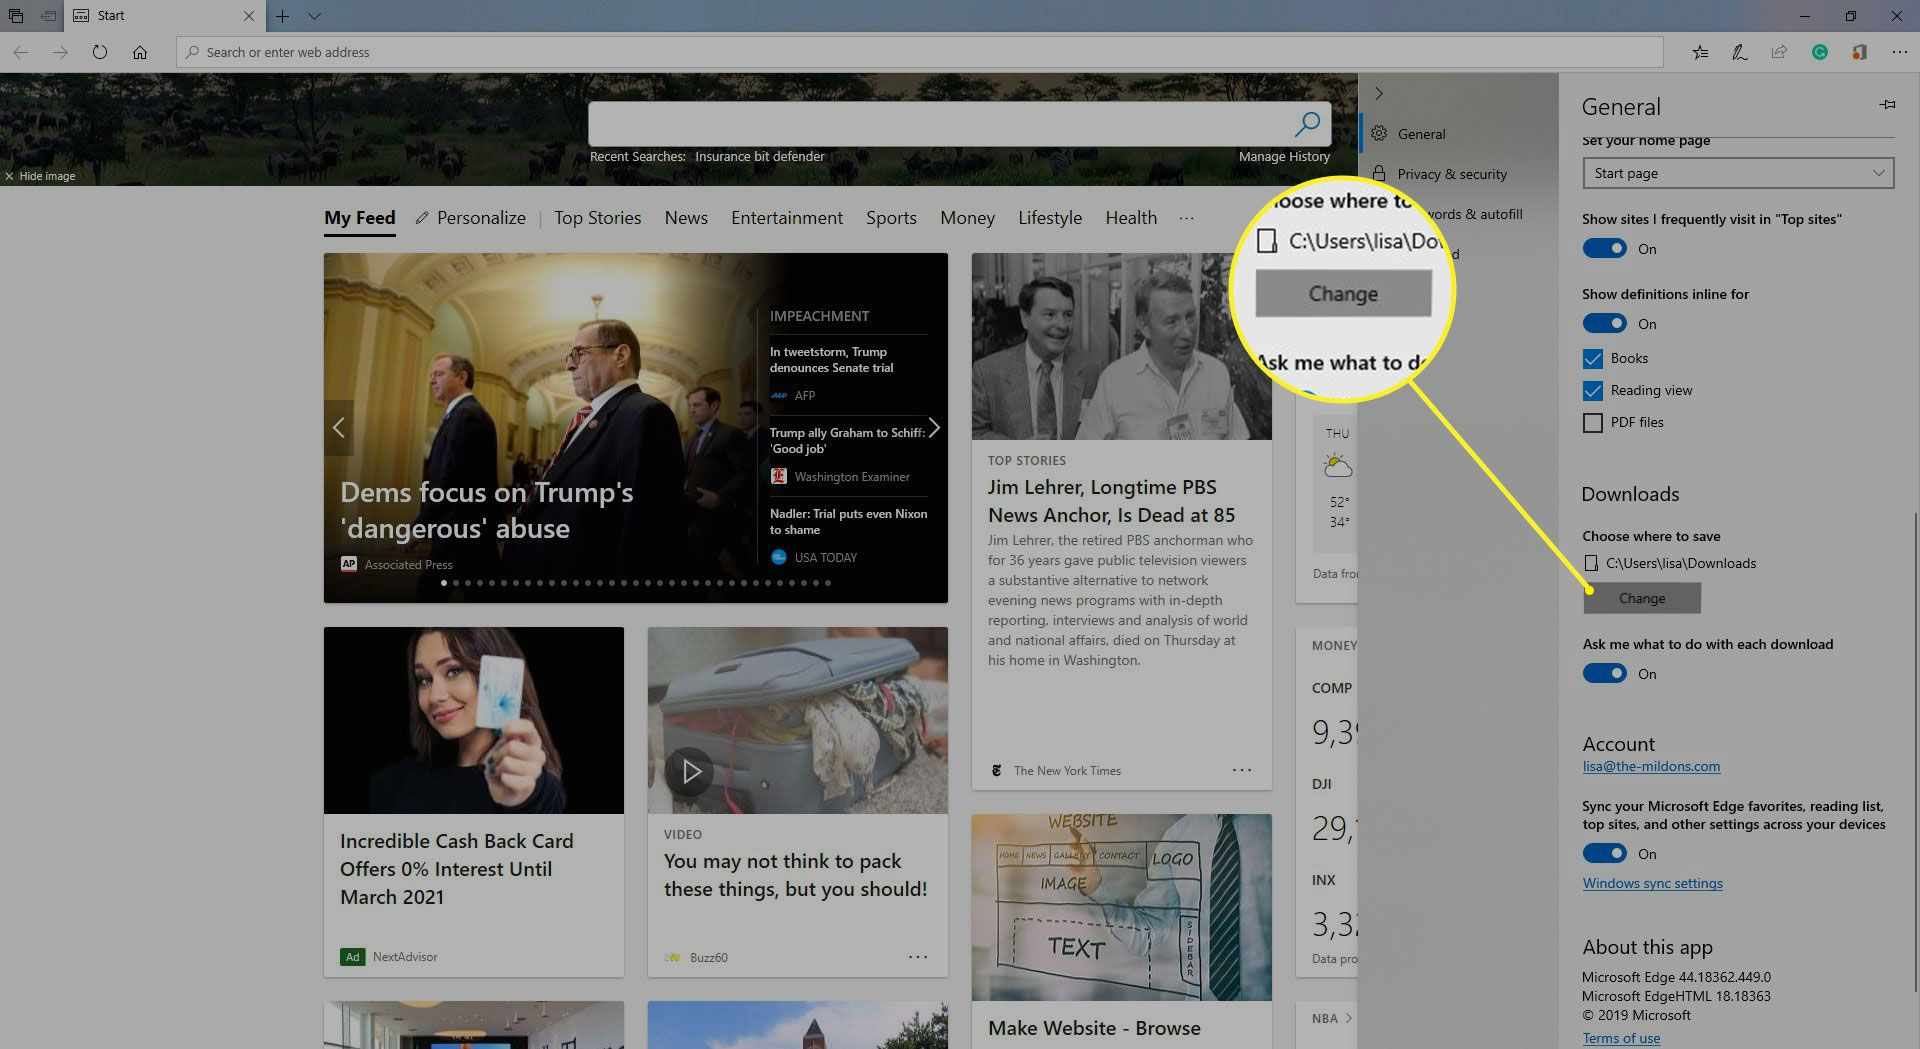 Microsoft Edge Settings > General > Change